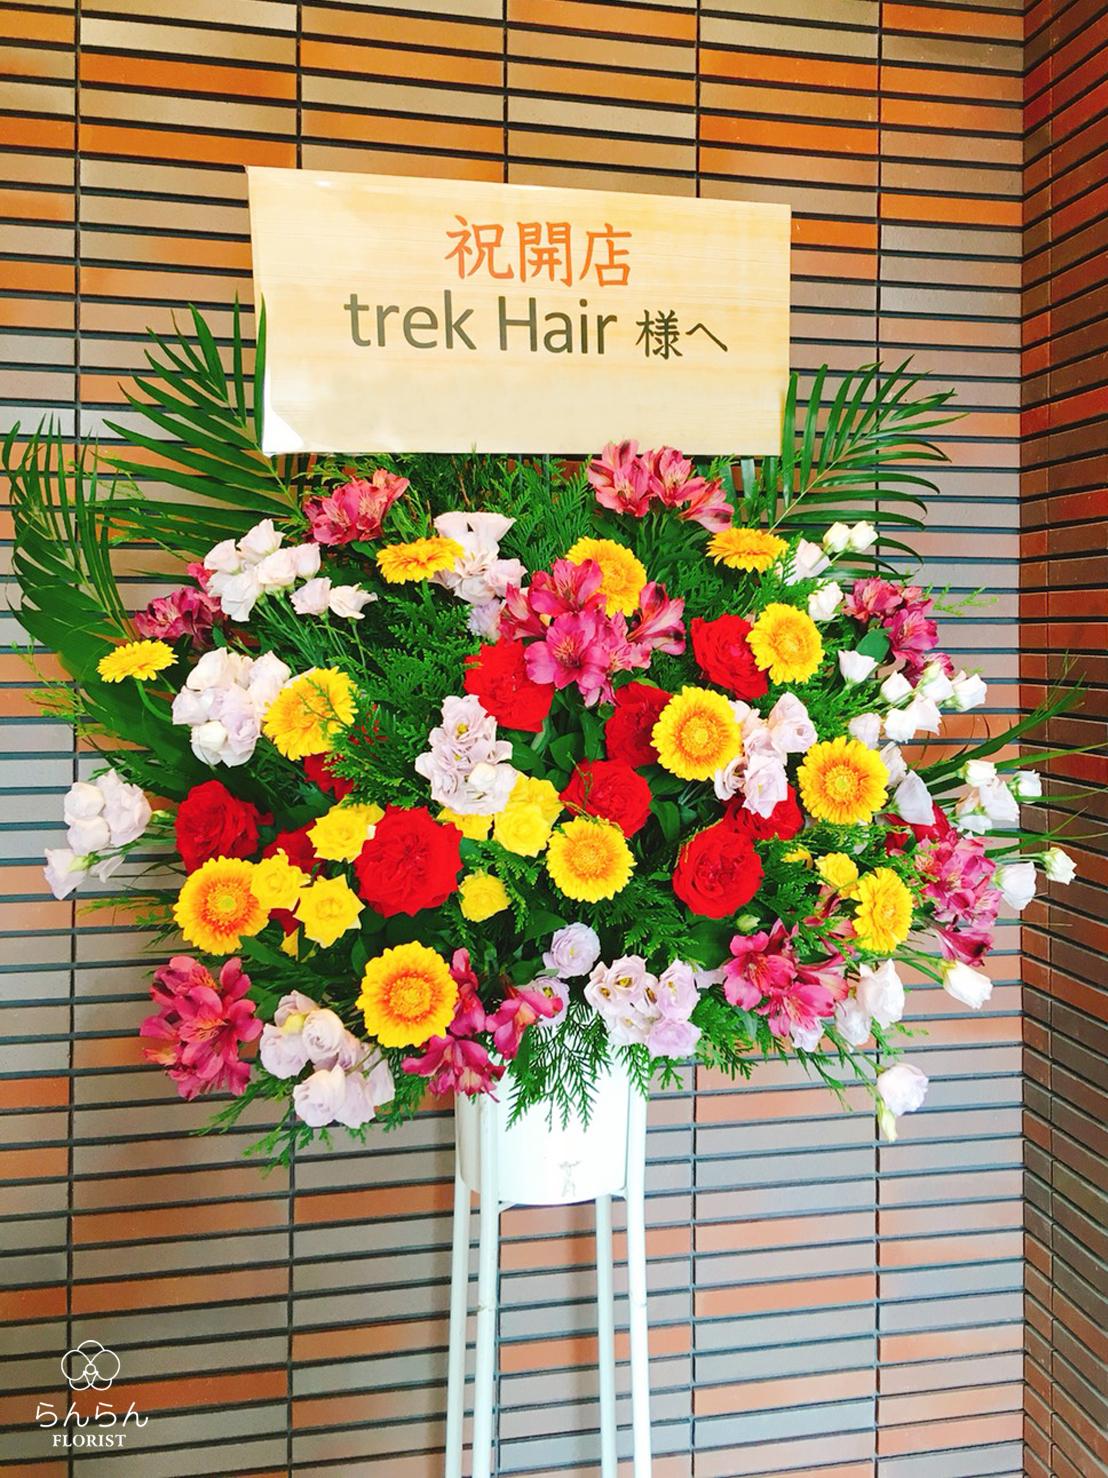 trek Hair お祝いスタンド花